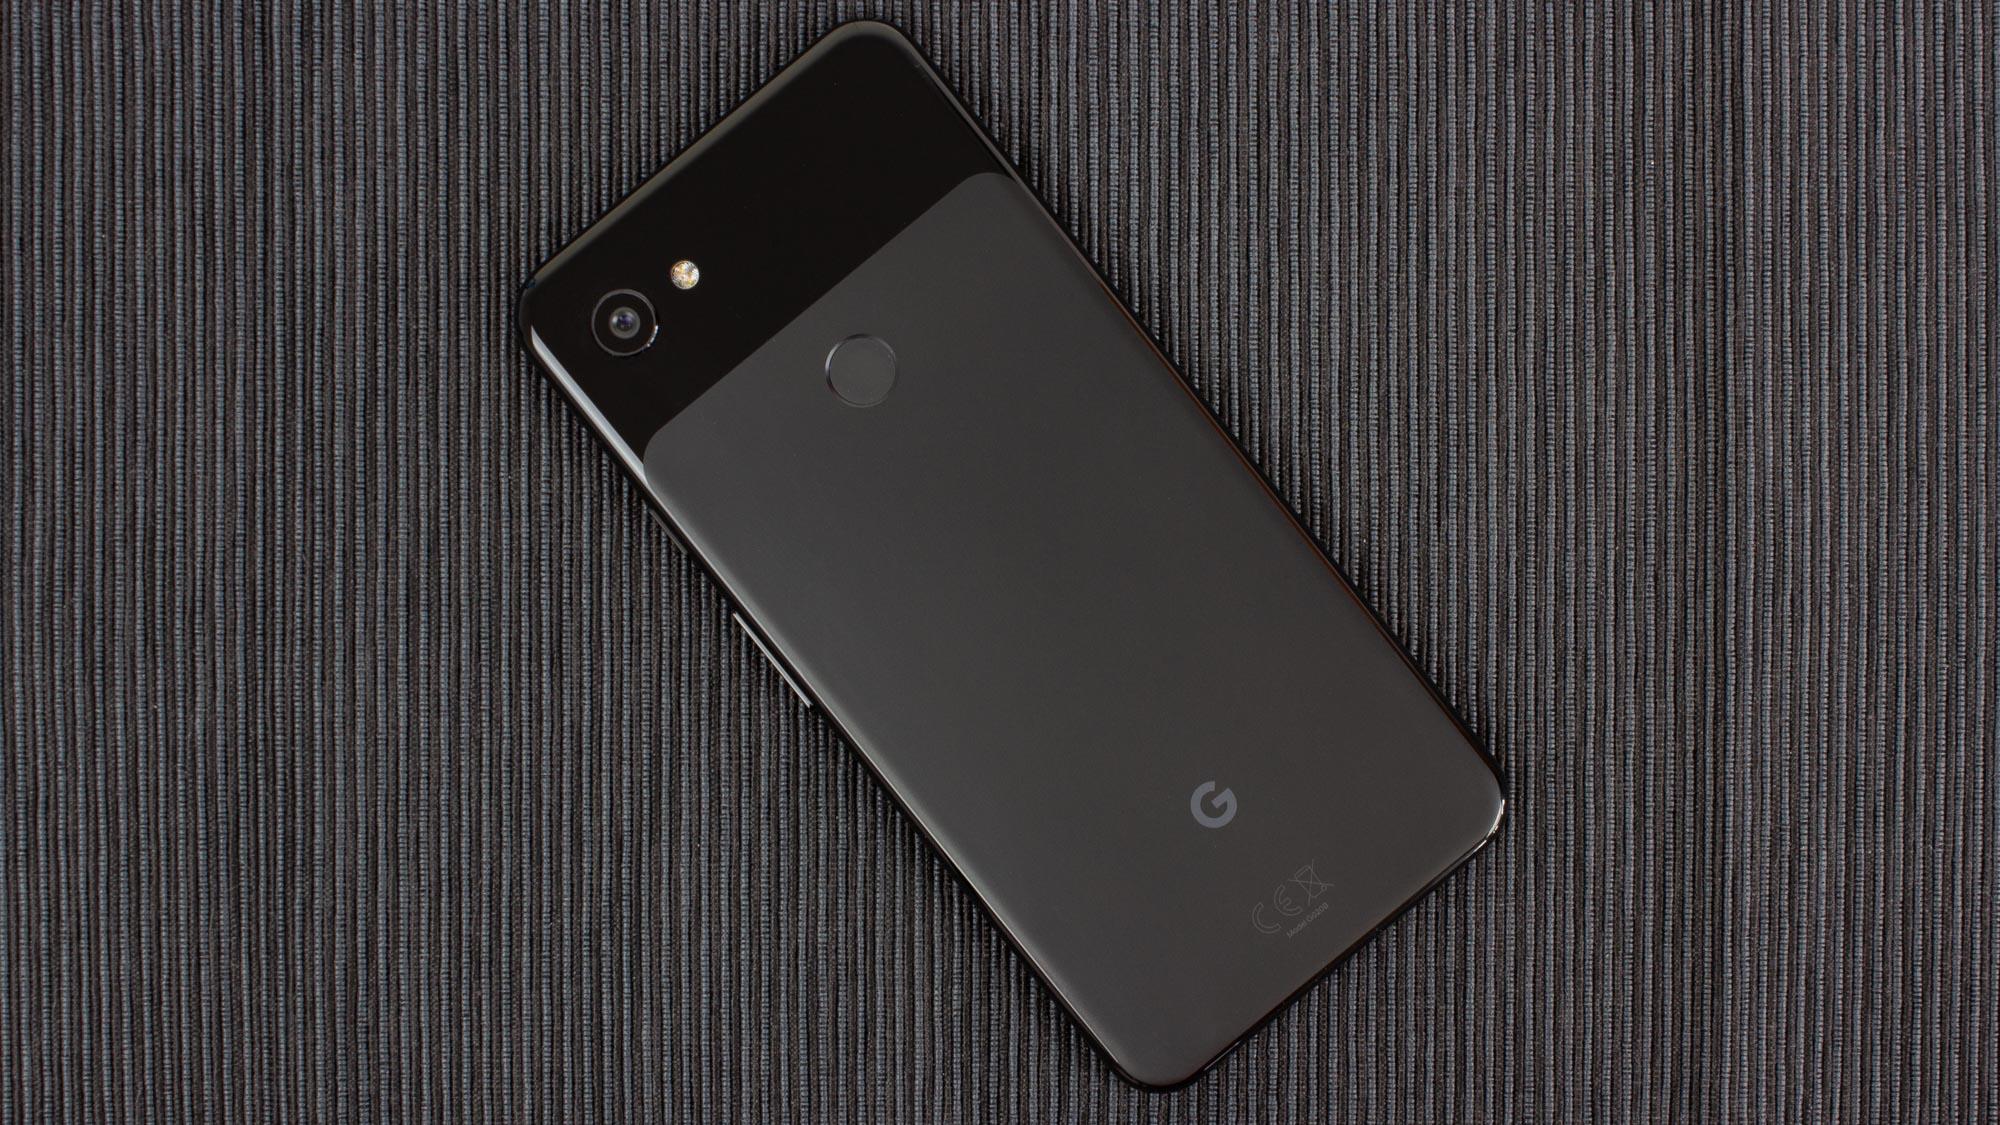 Google Pixel 3a XL in Just Black